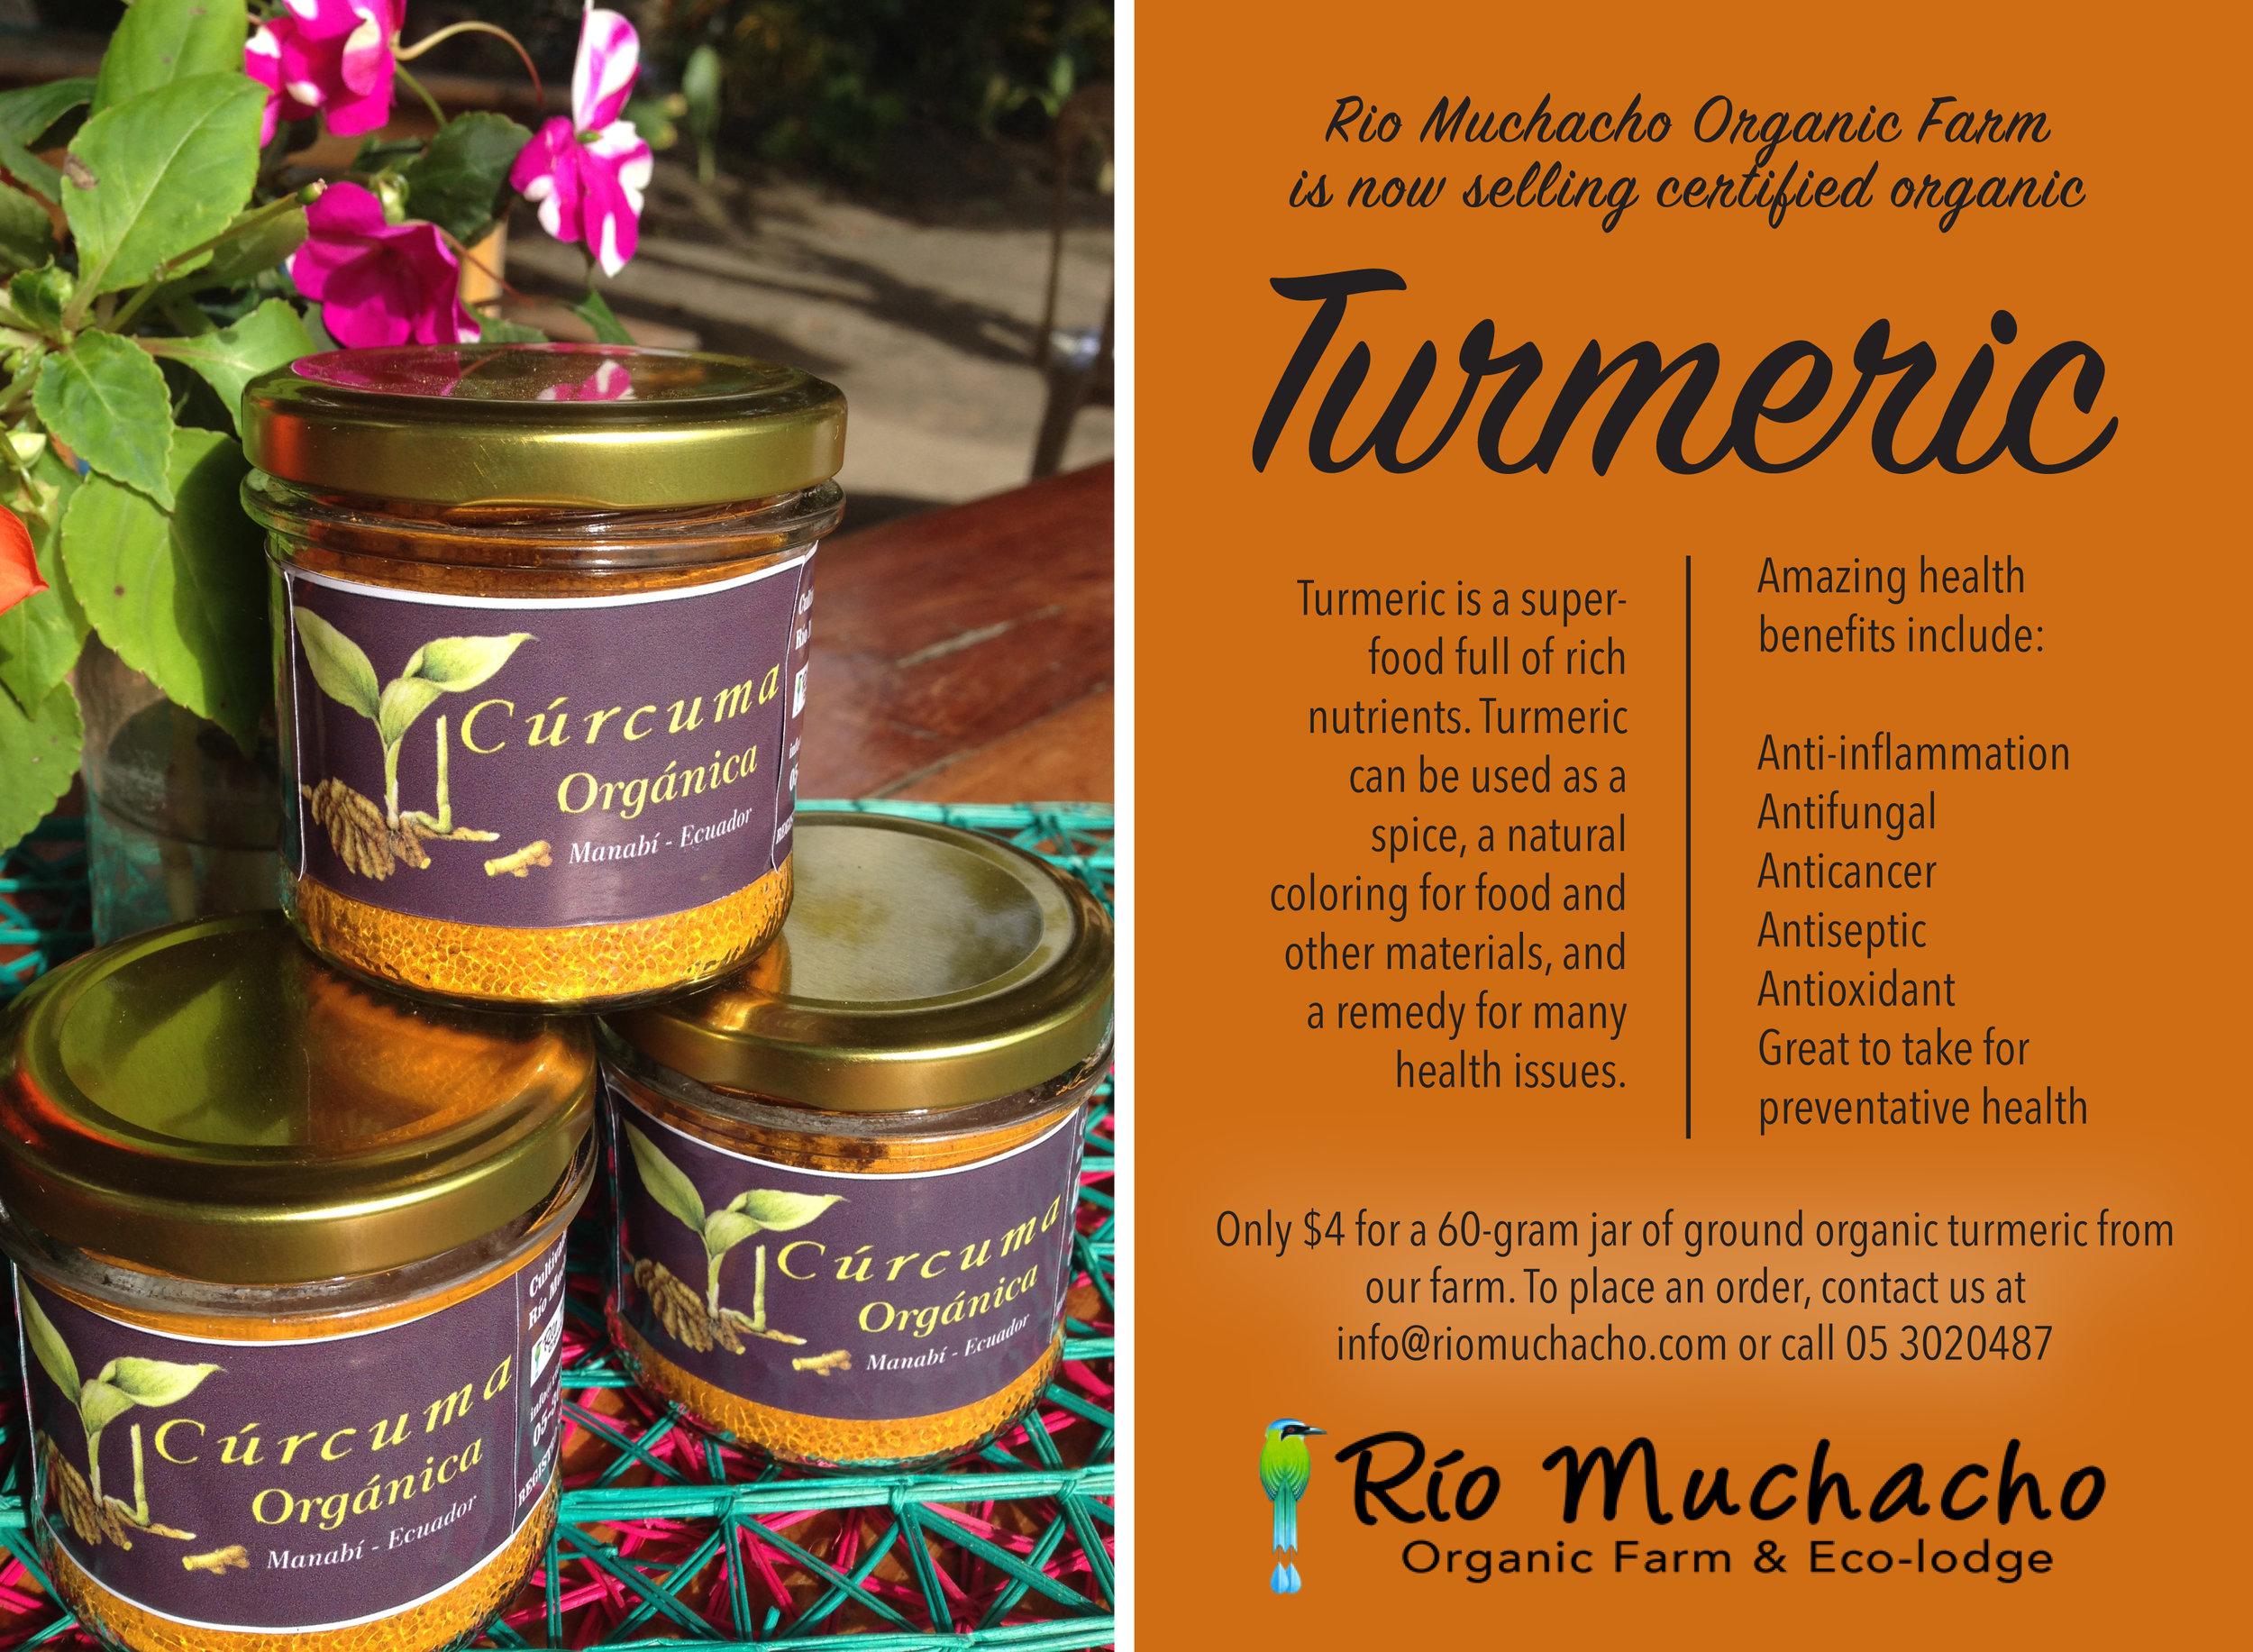 RioMuchacho_Turmeric.jpg